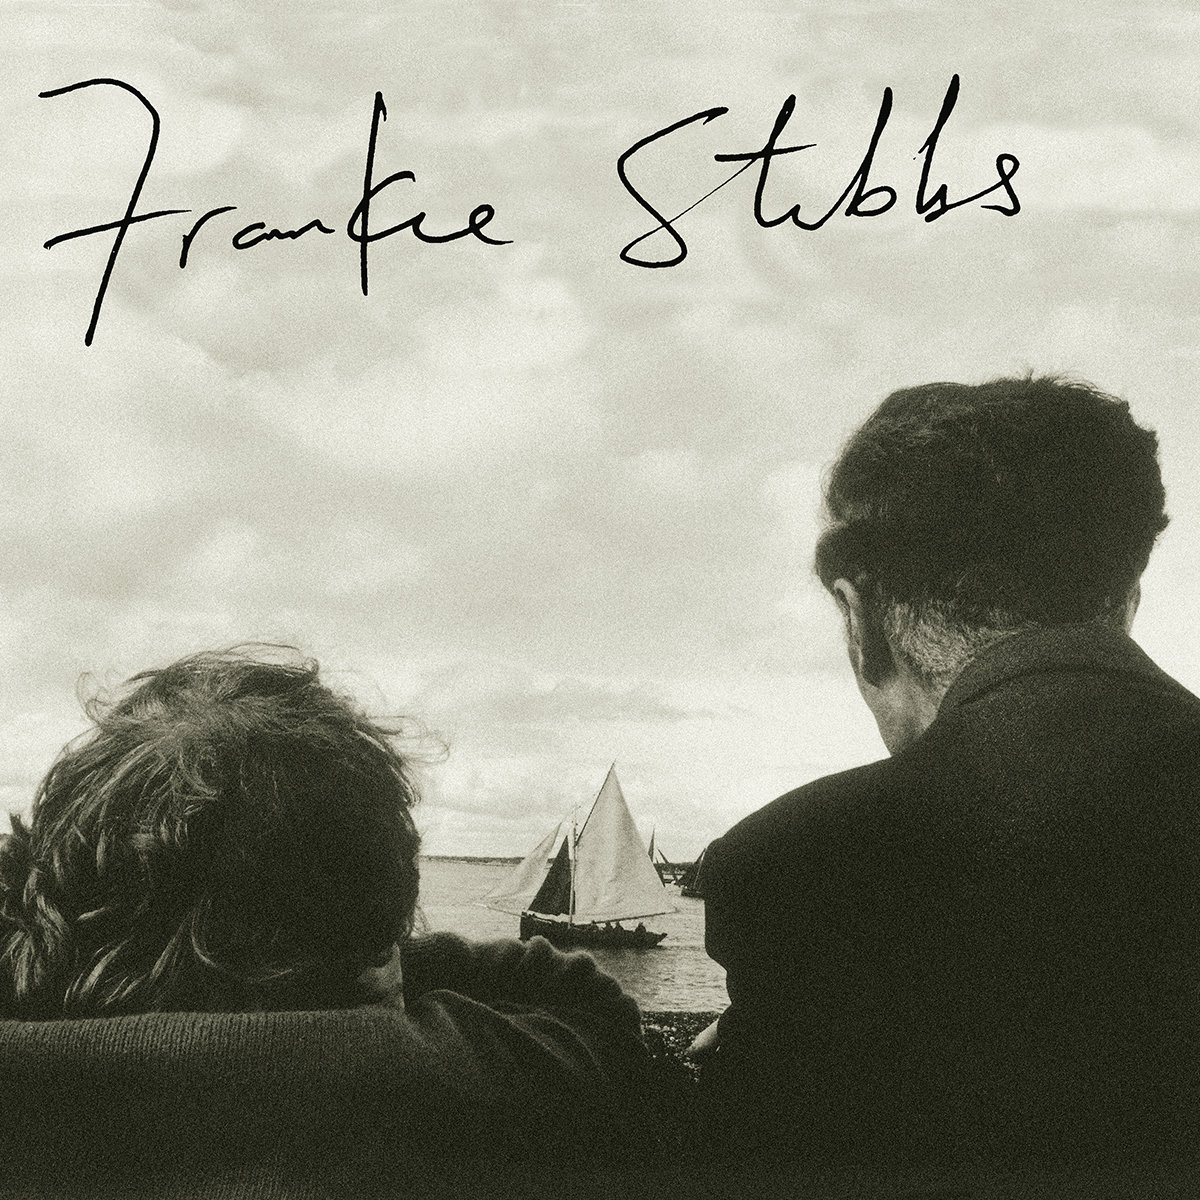 Frankie Stubbs - s/t 10